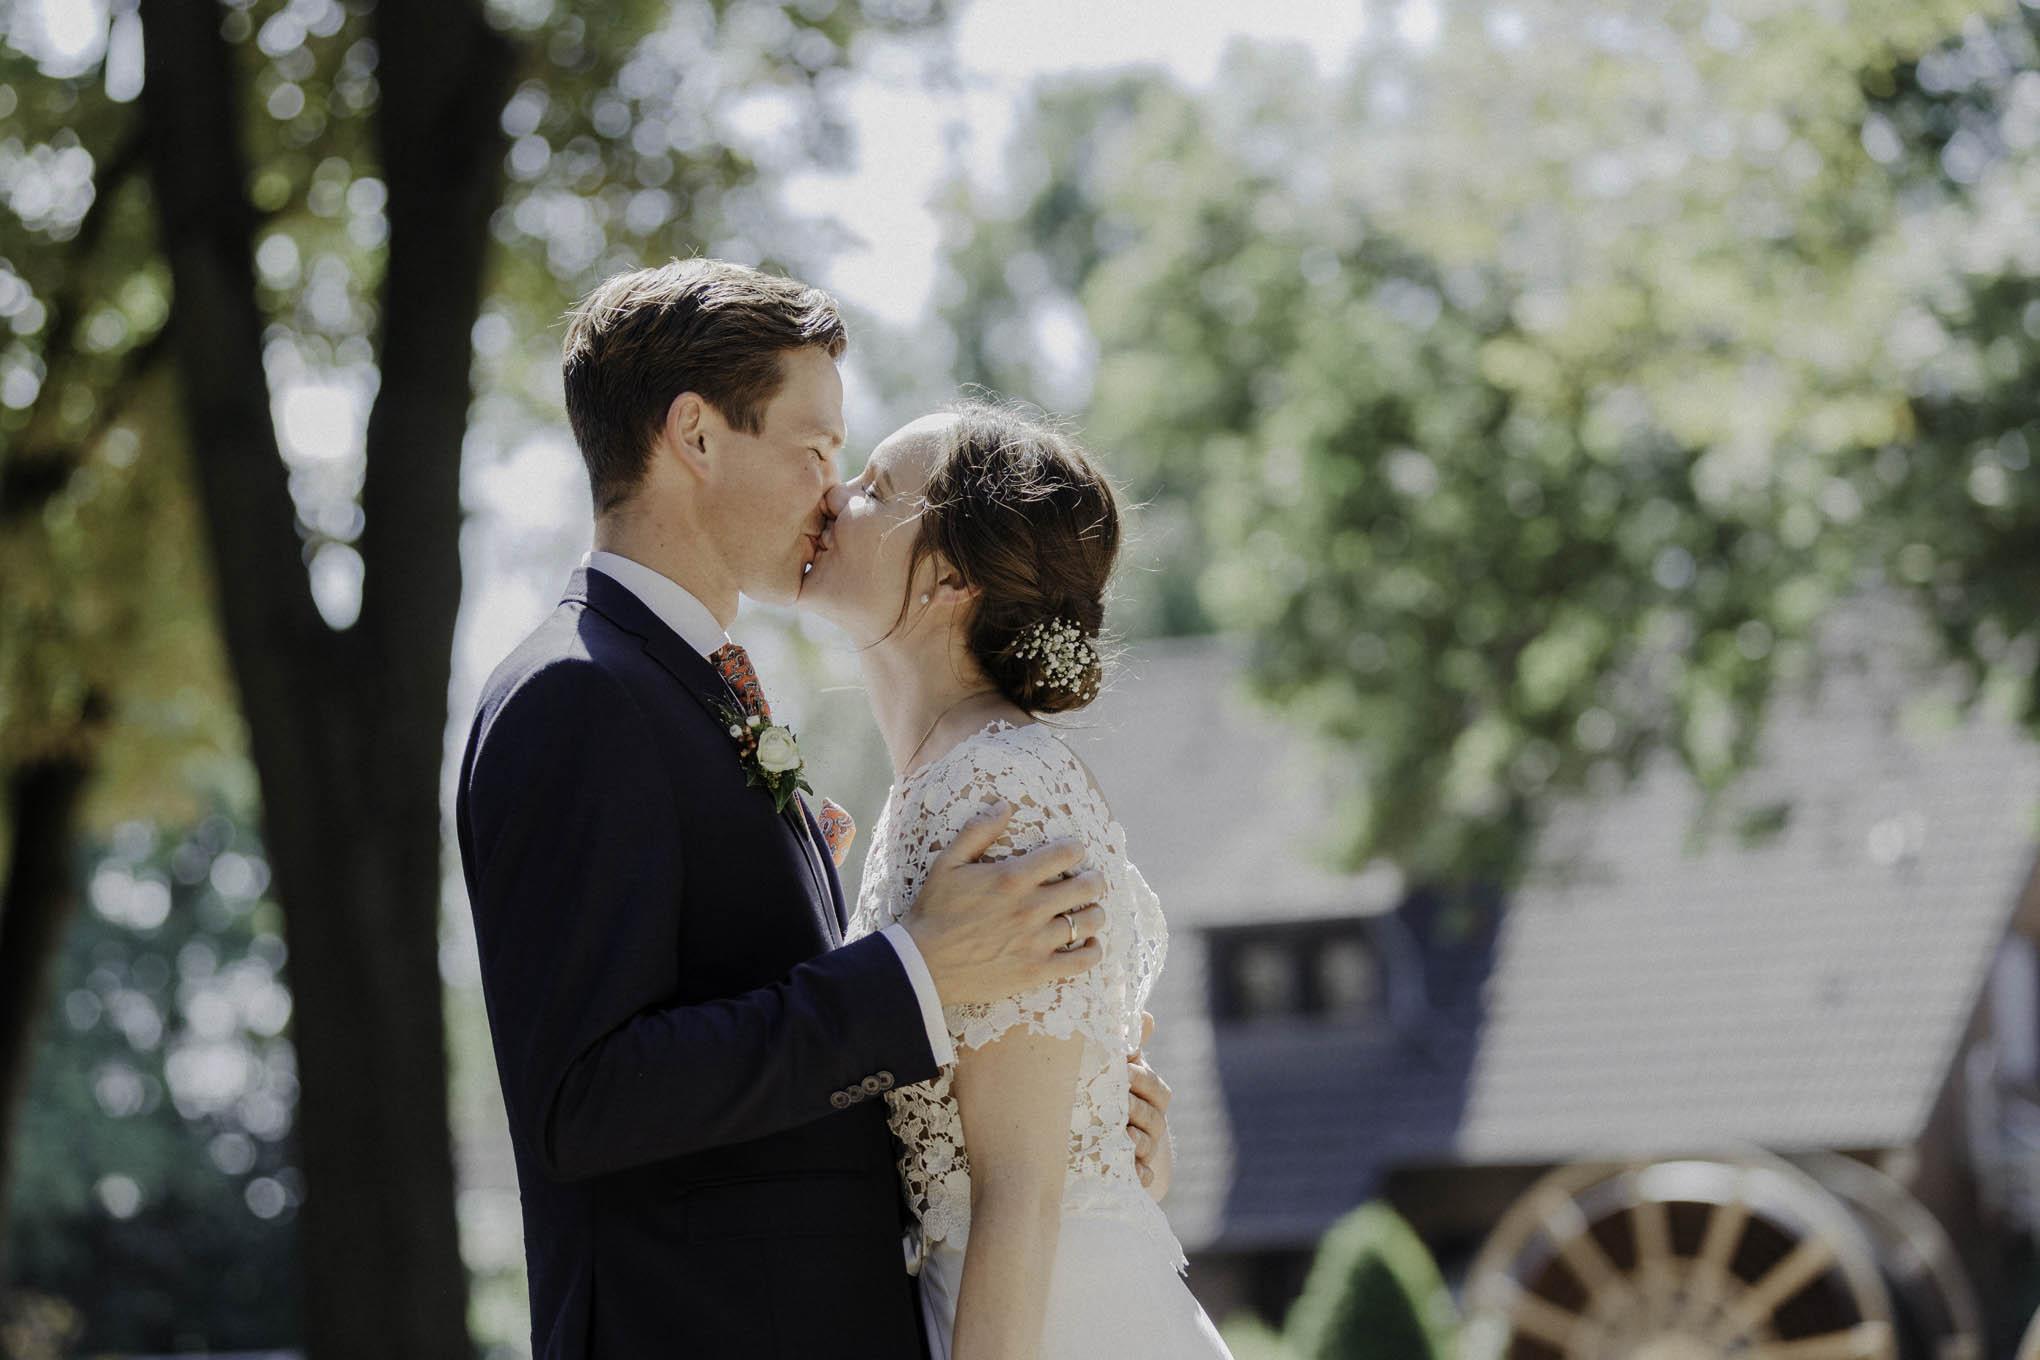 Brautpaarfoto